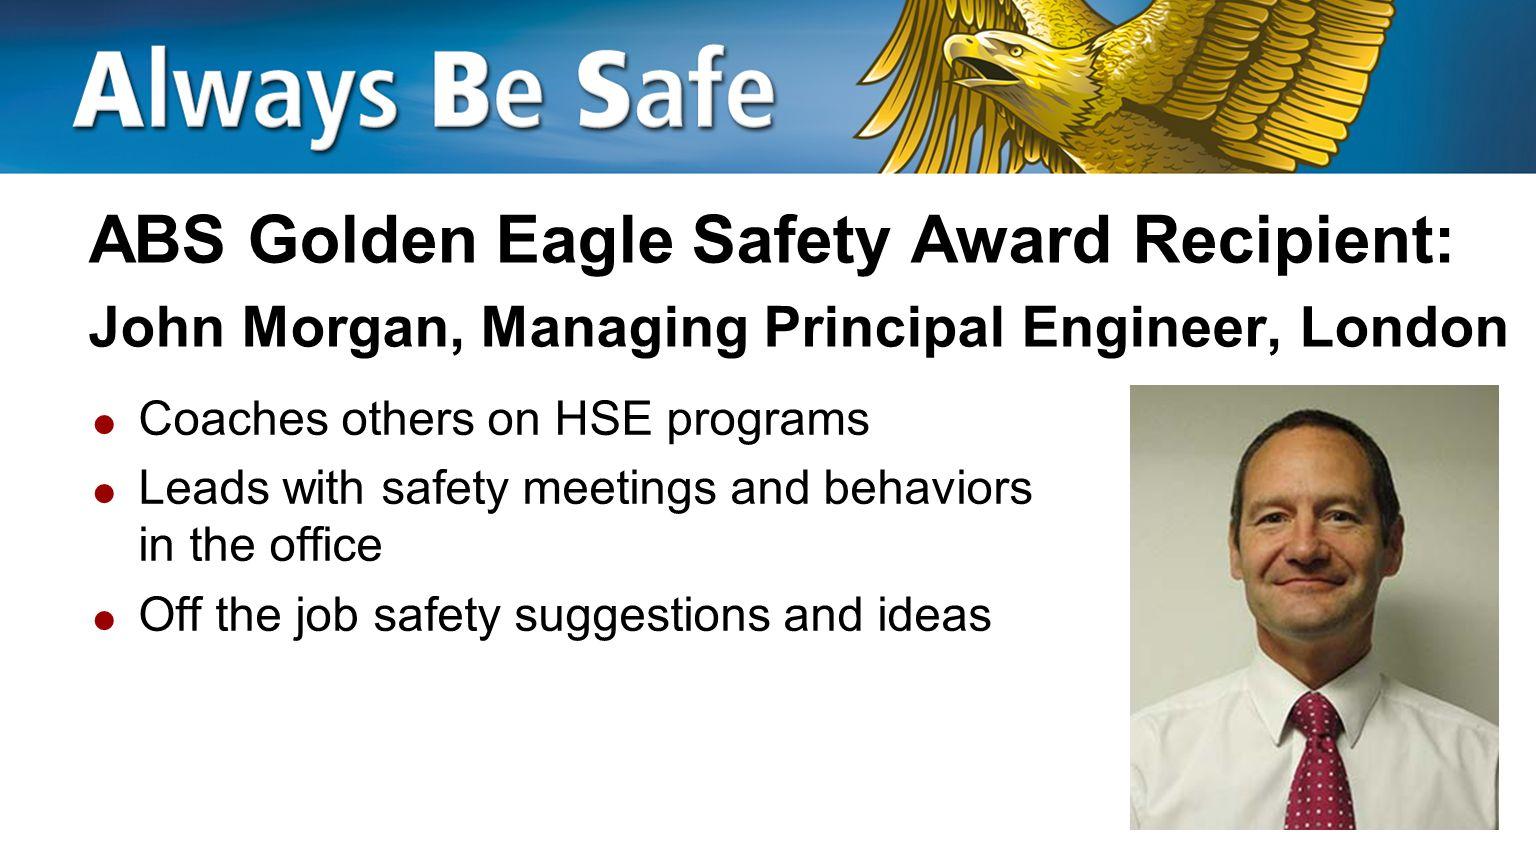 ABS Golden Eagle Safety Award Recipient: John Morgan, Managing Principal Engineer, London